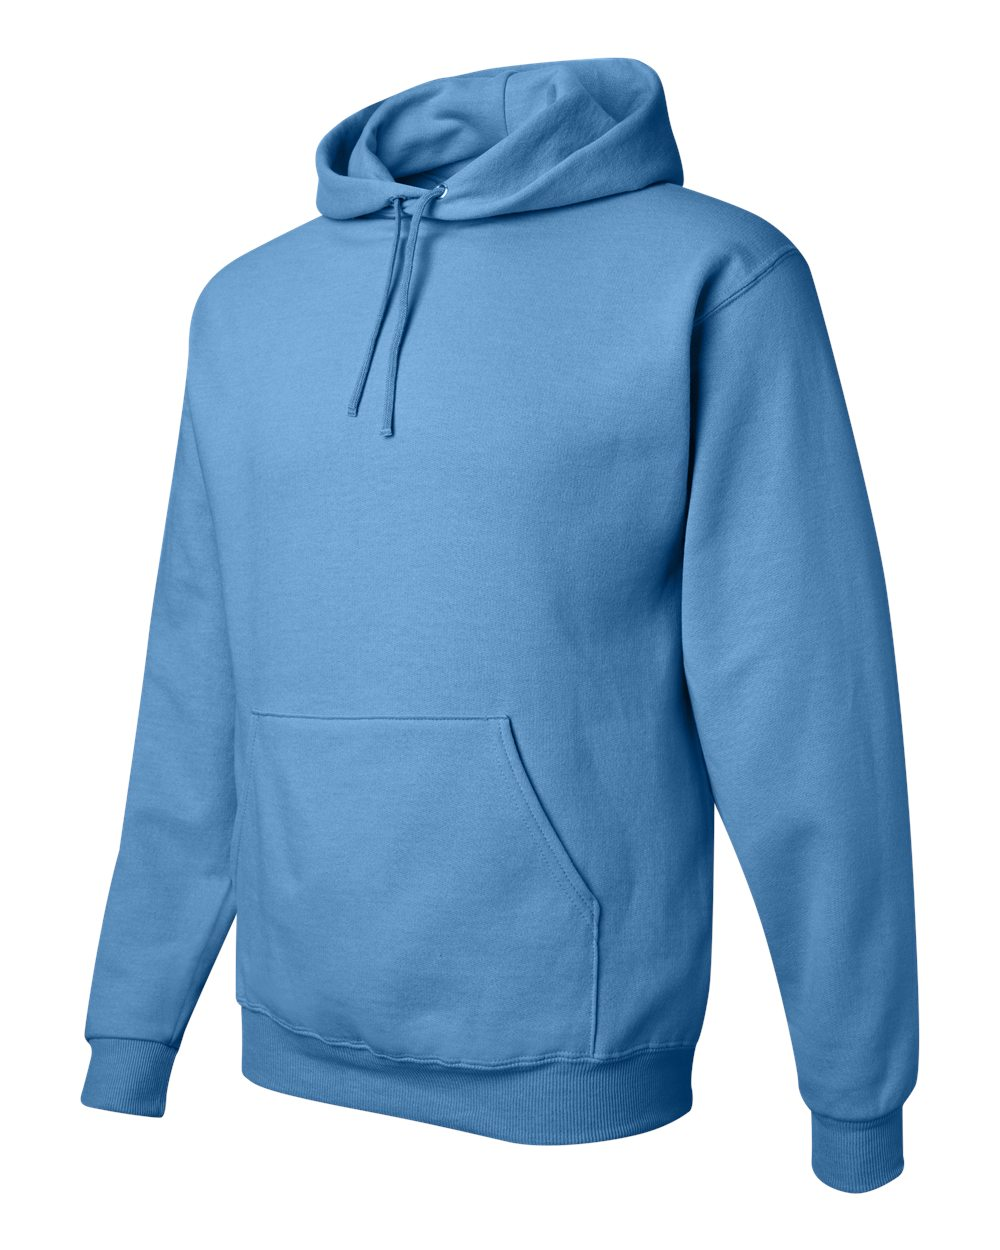 M Jerzees Mens NuBlend Pull Over Hooded Sweatshirt JZ996MR